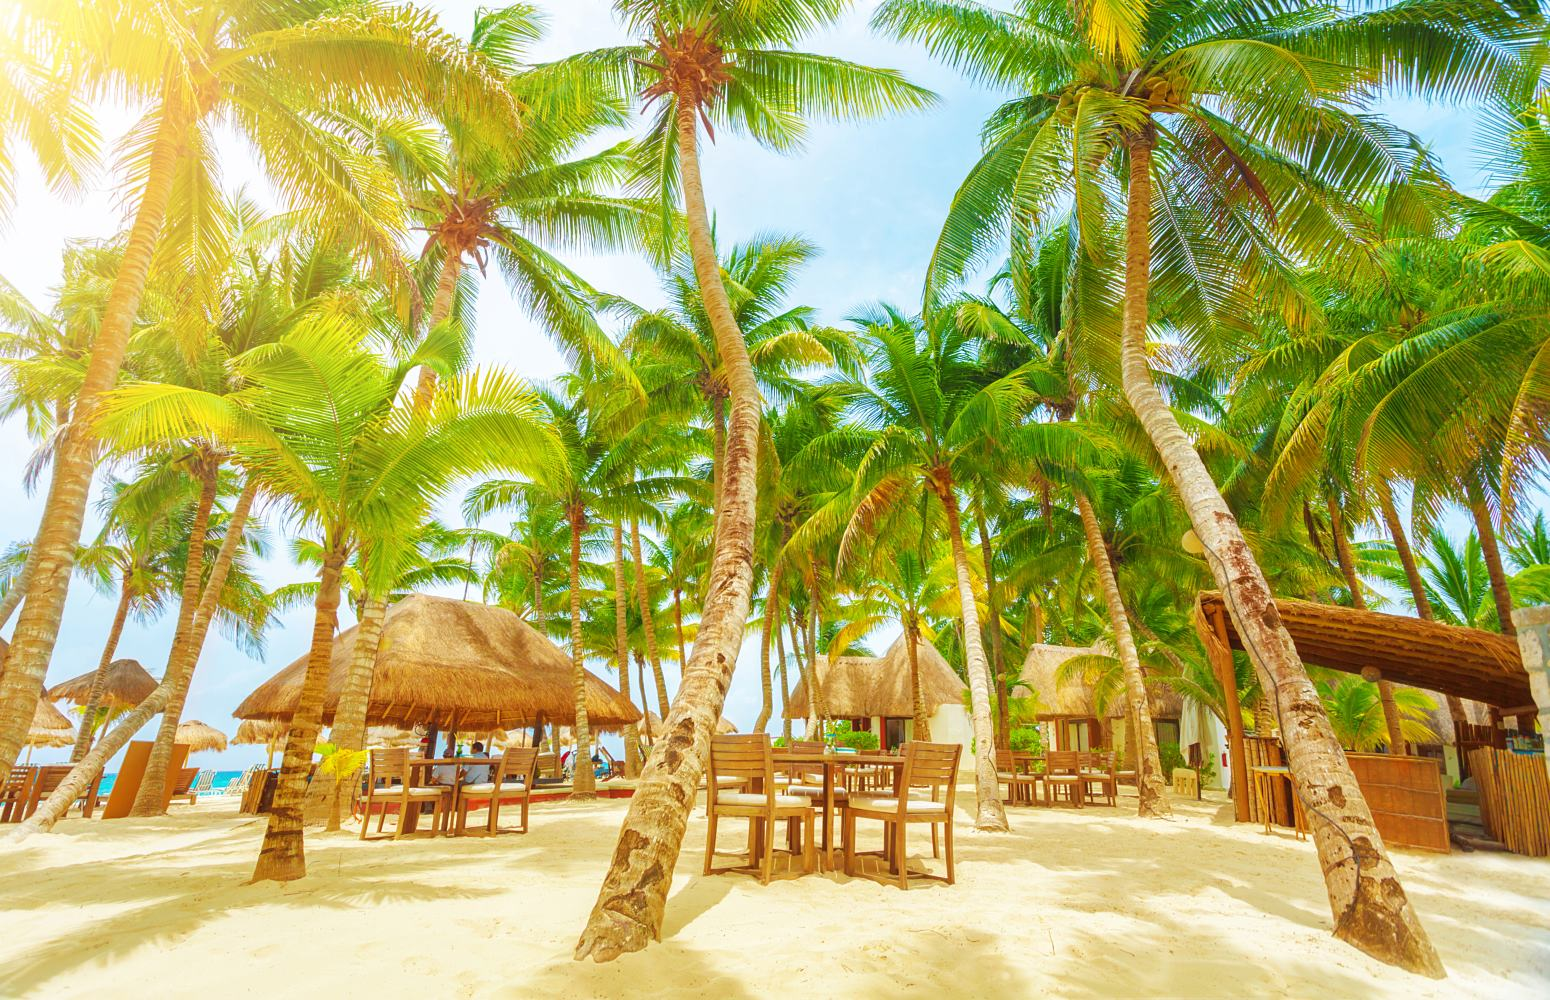 mexico-quintana-roo-playa-del-carmen